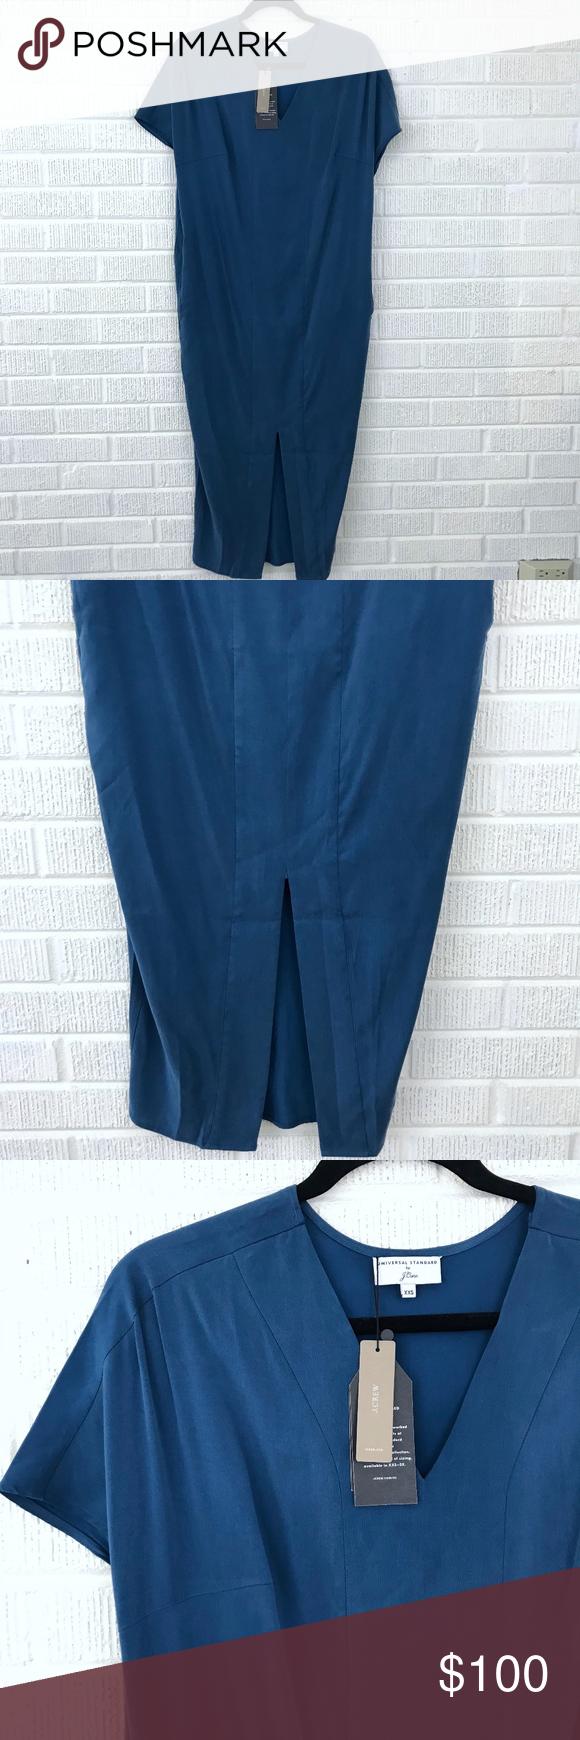 62b62e1c06c Universal Standard for J.Crew Cupro Tunic Dress Universal Standard for J.Crew  Cupro Tunic Dress - Universal Standard for J.Crew - Cupro Tunic Dress -  Style ...